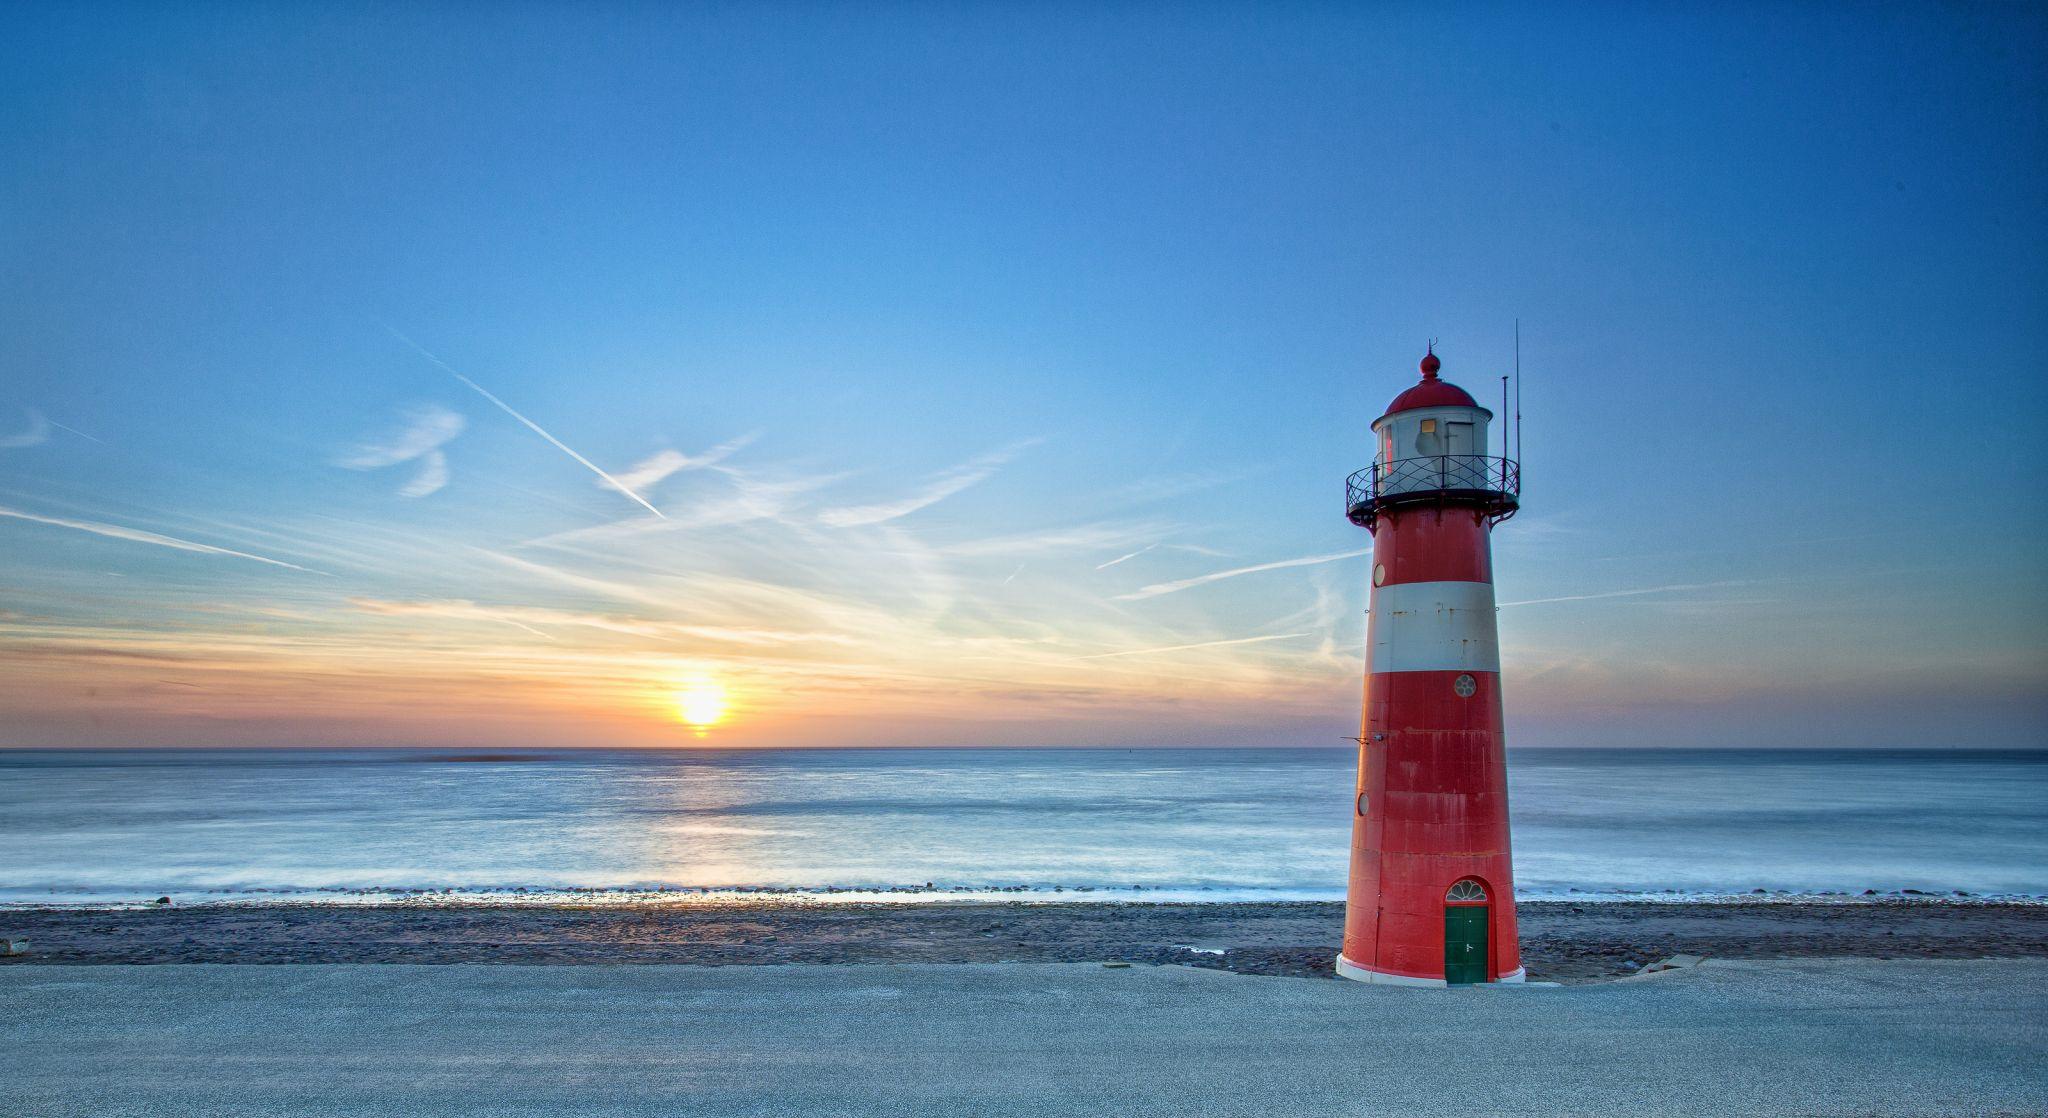 Lighthouse Westkapelle small, Netherlands